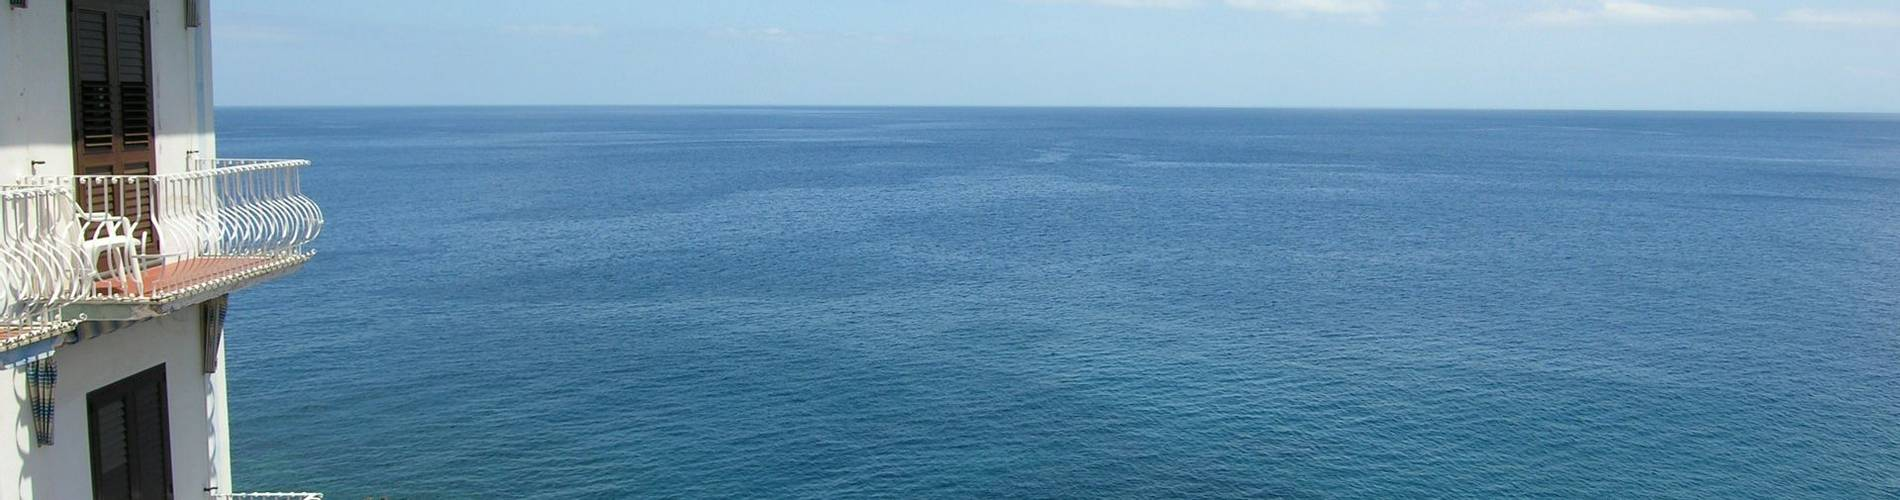 Rocce Azzurre, Sicily, Italy (11).JPG